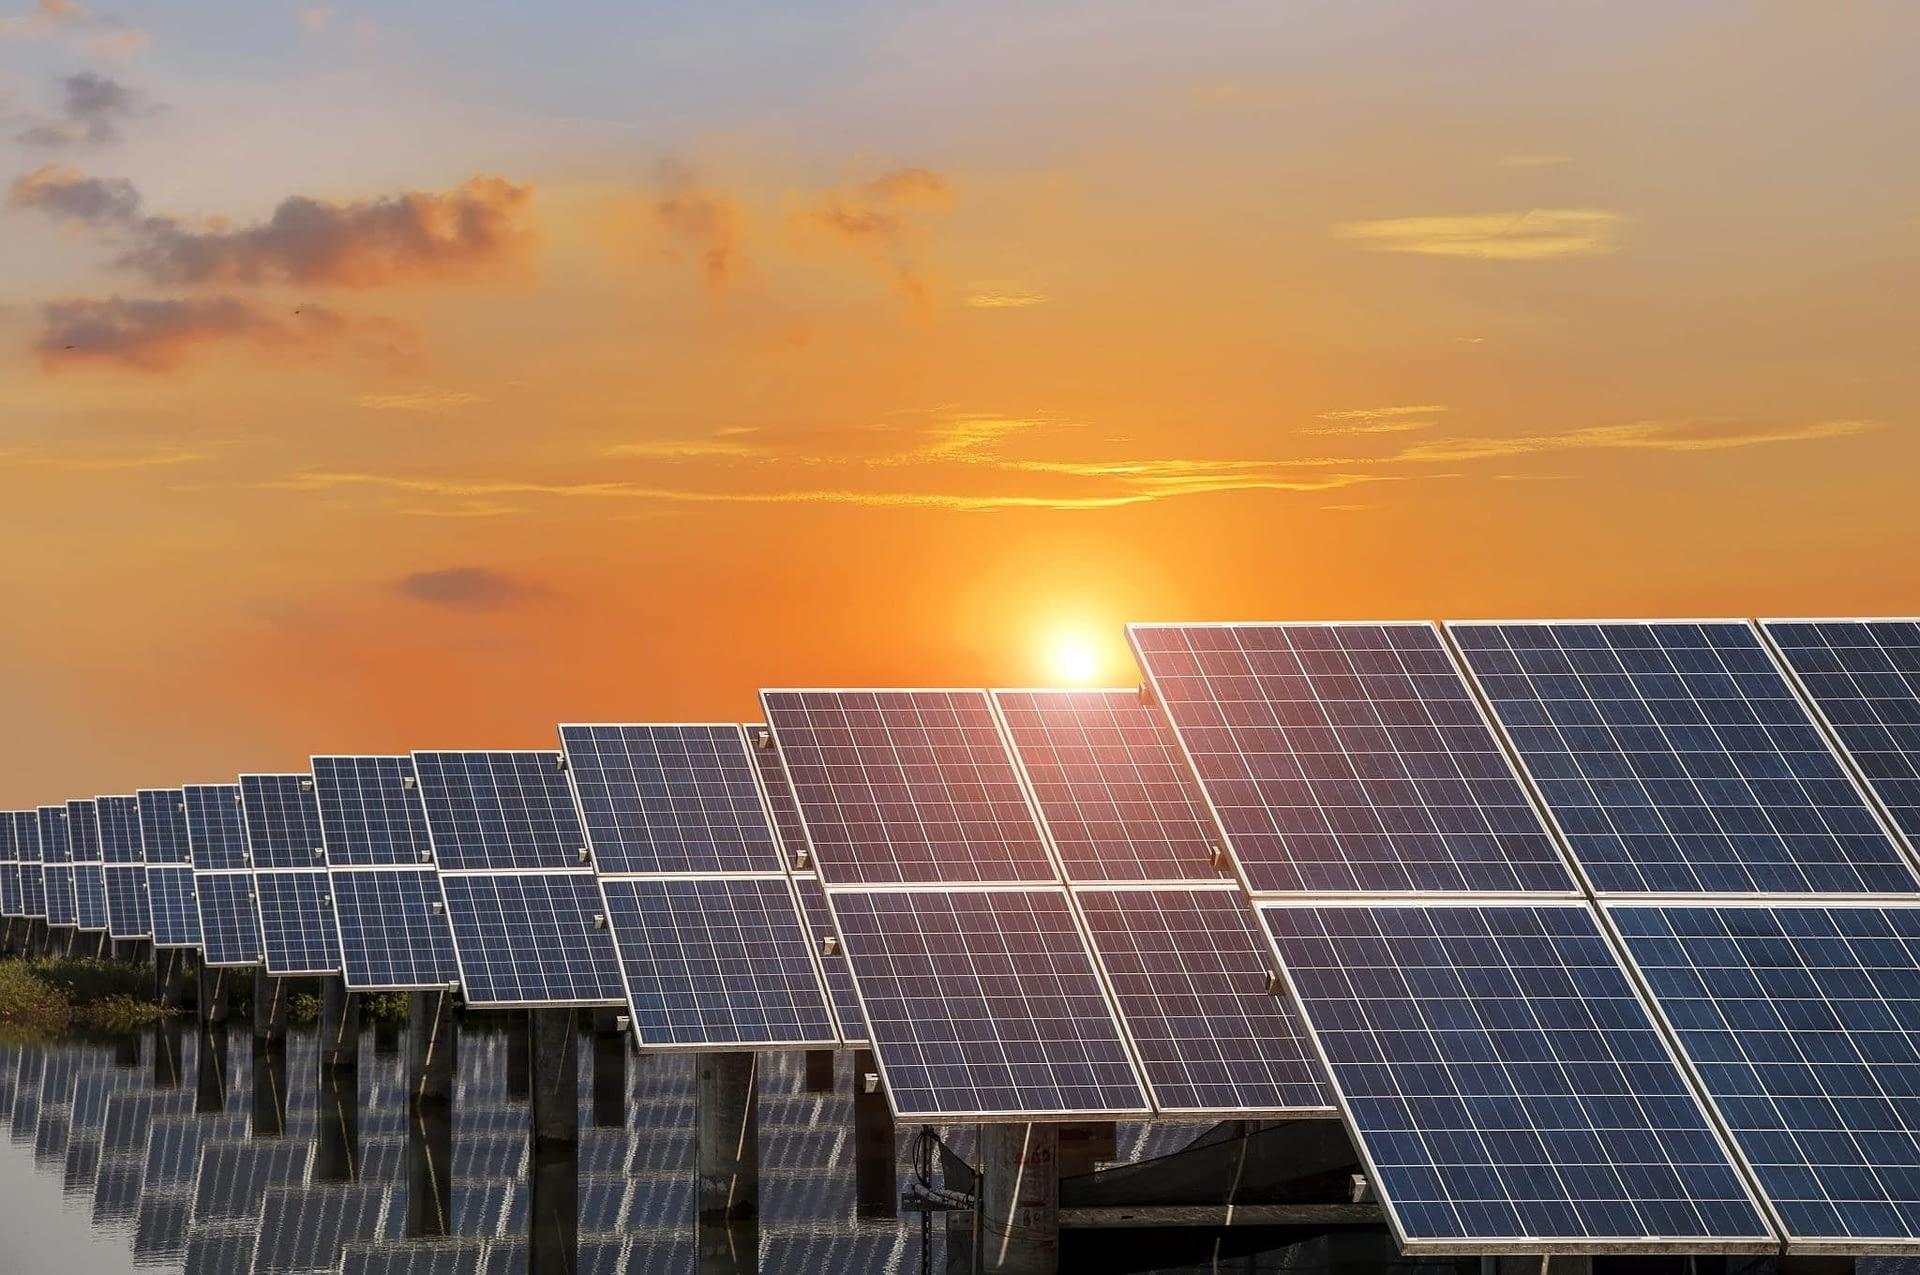 Nuevo León's energy sector will bet on solar energy in 2021